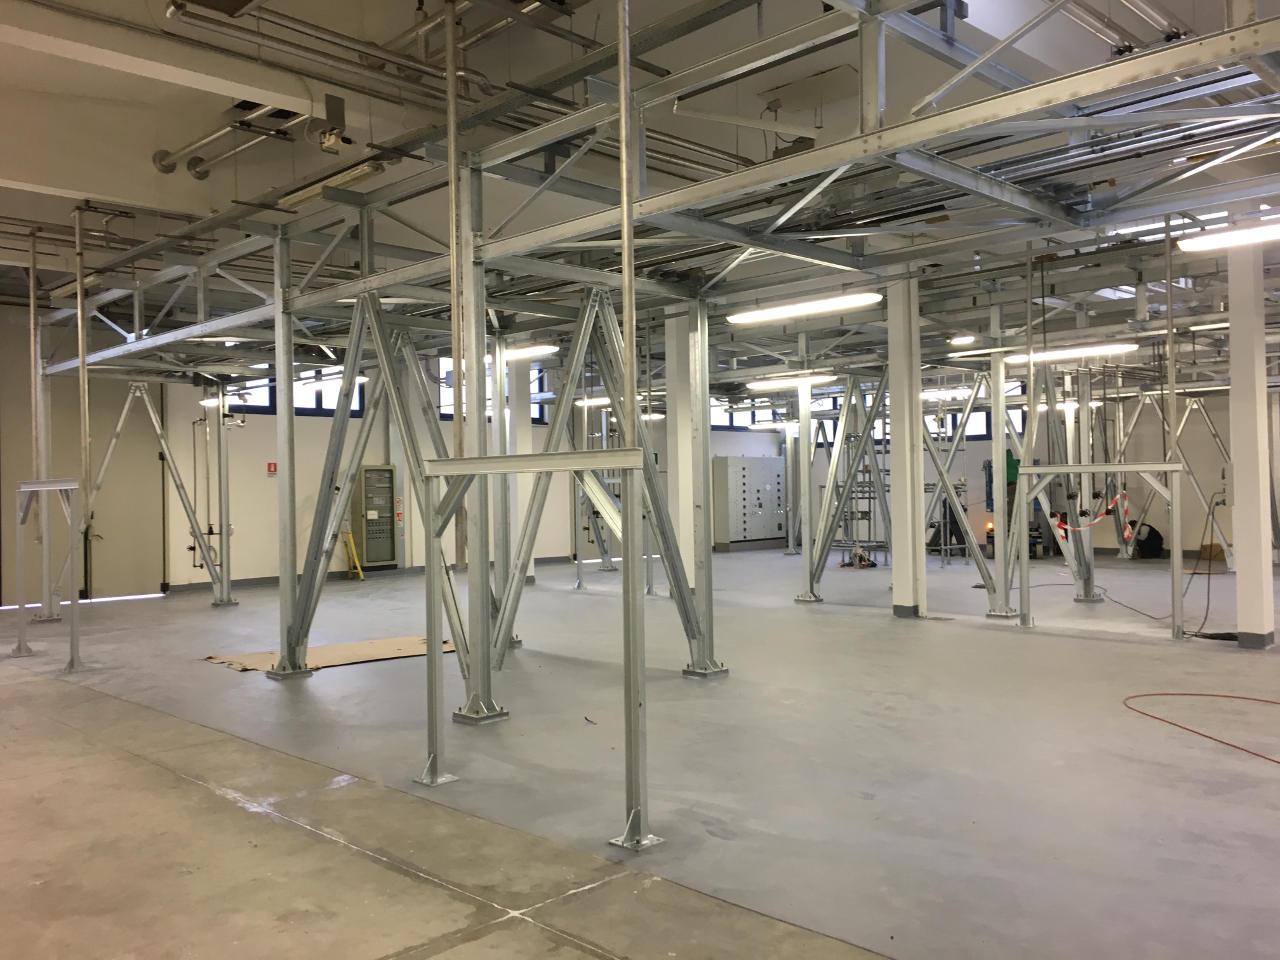 Impianti Elettrici per industrie Aura Impianti Provincia di Rimini